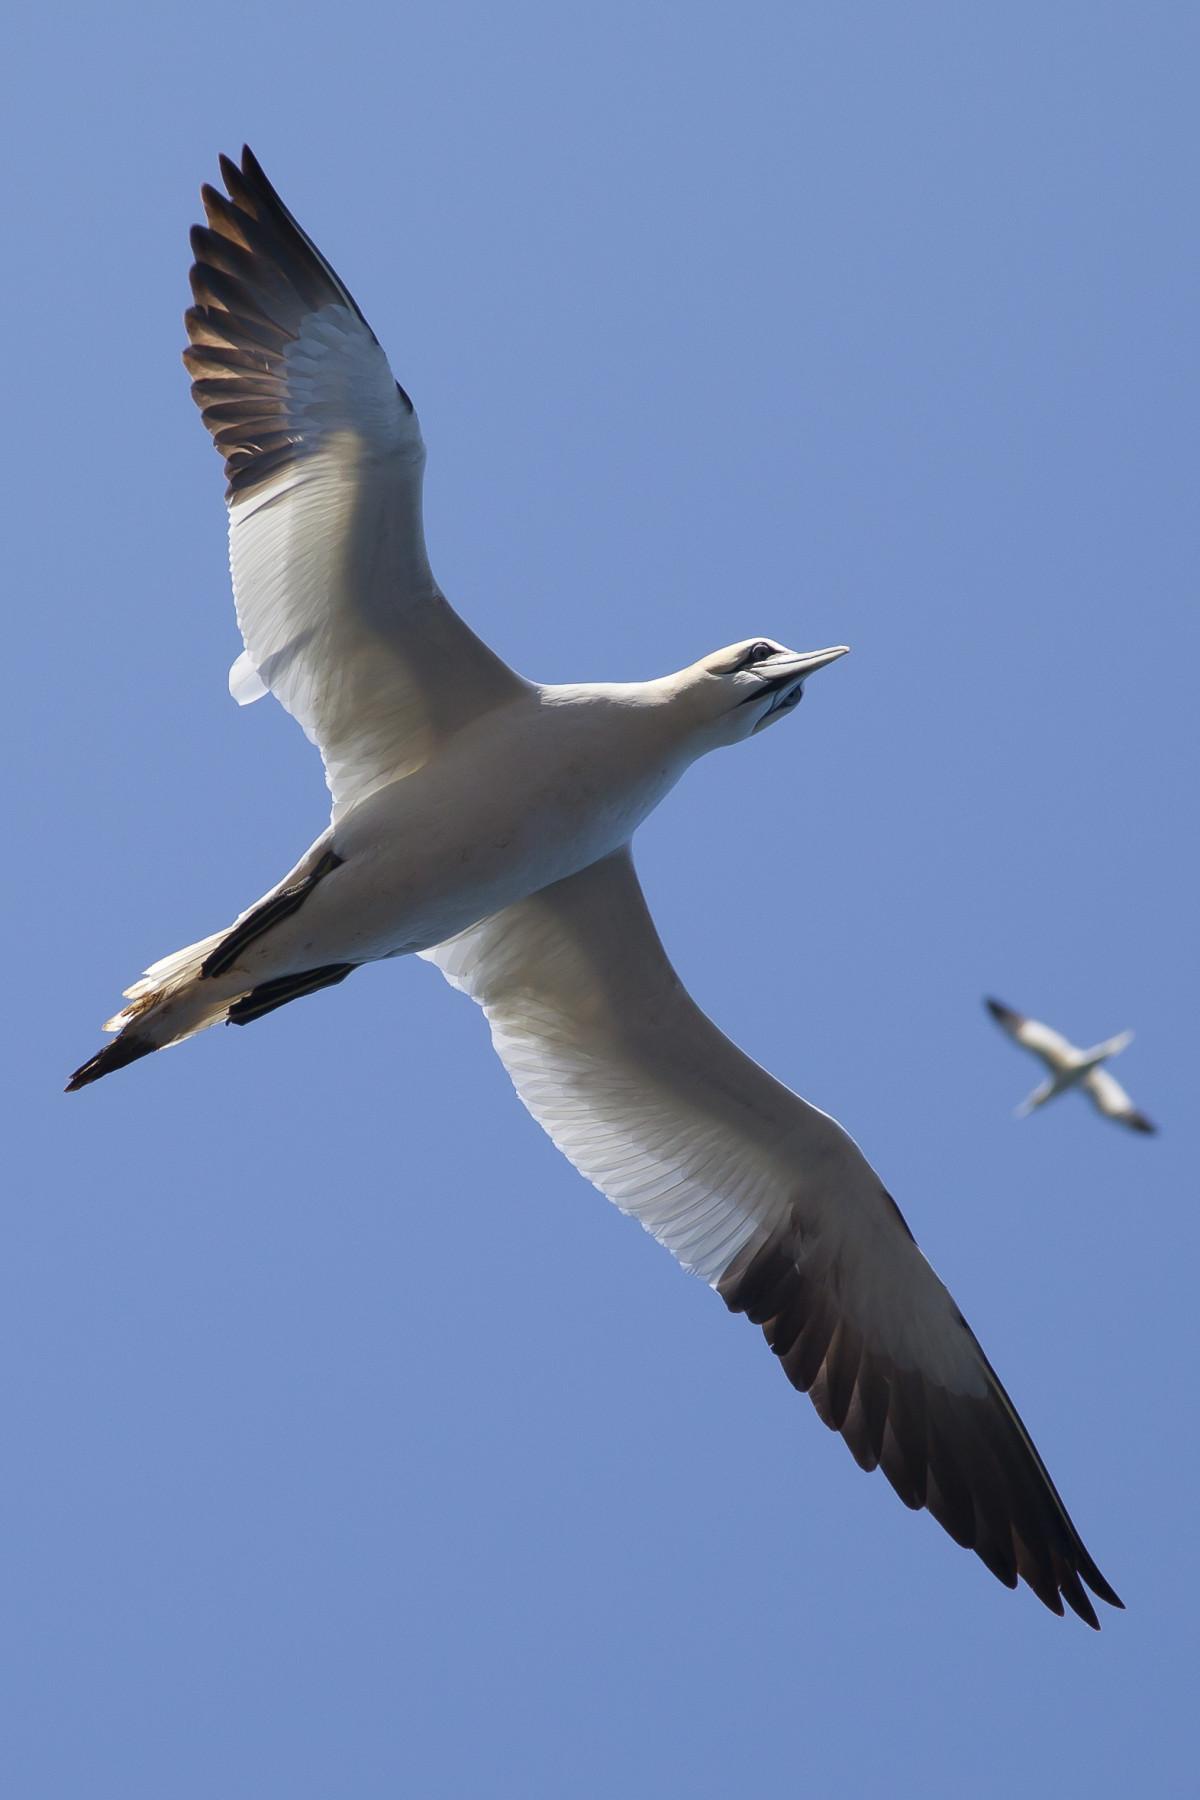 Animals Birds Flight Flying Gulls Seagulls Sky Wings Sule